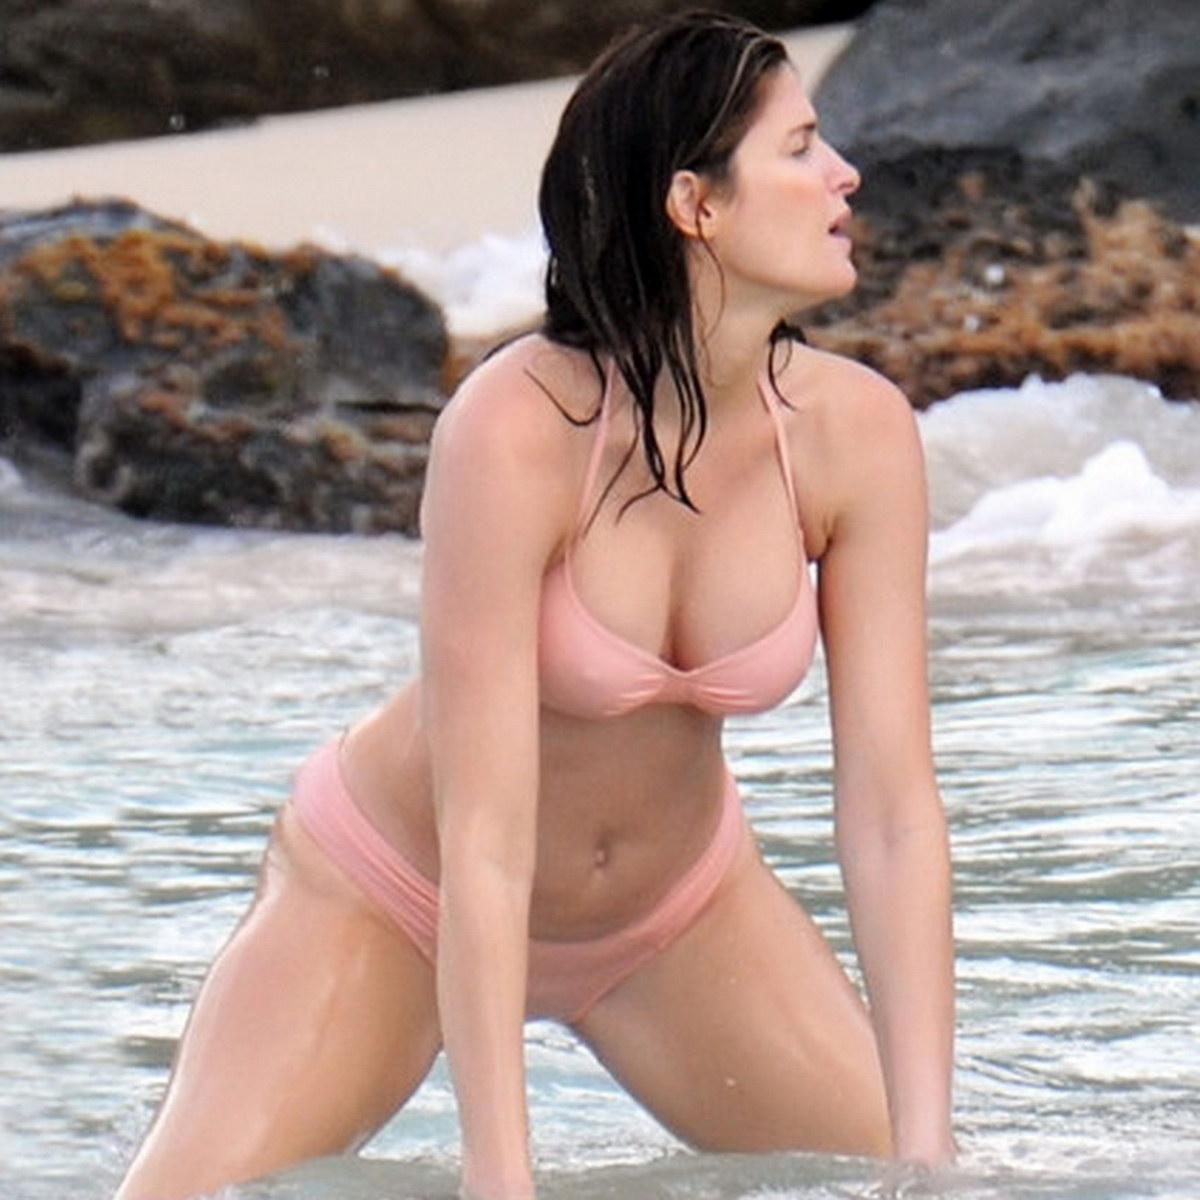 hot girl cream gif naked